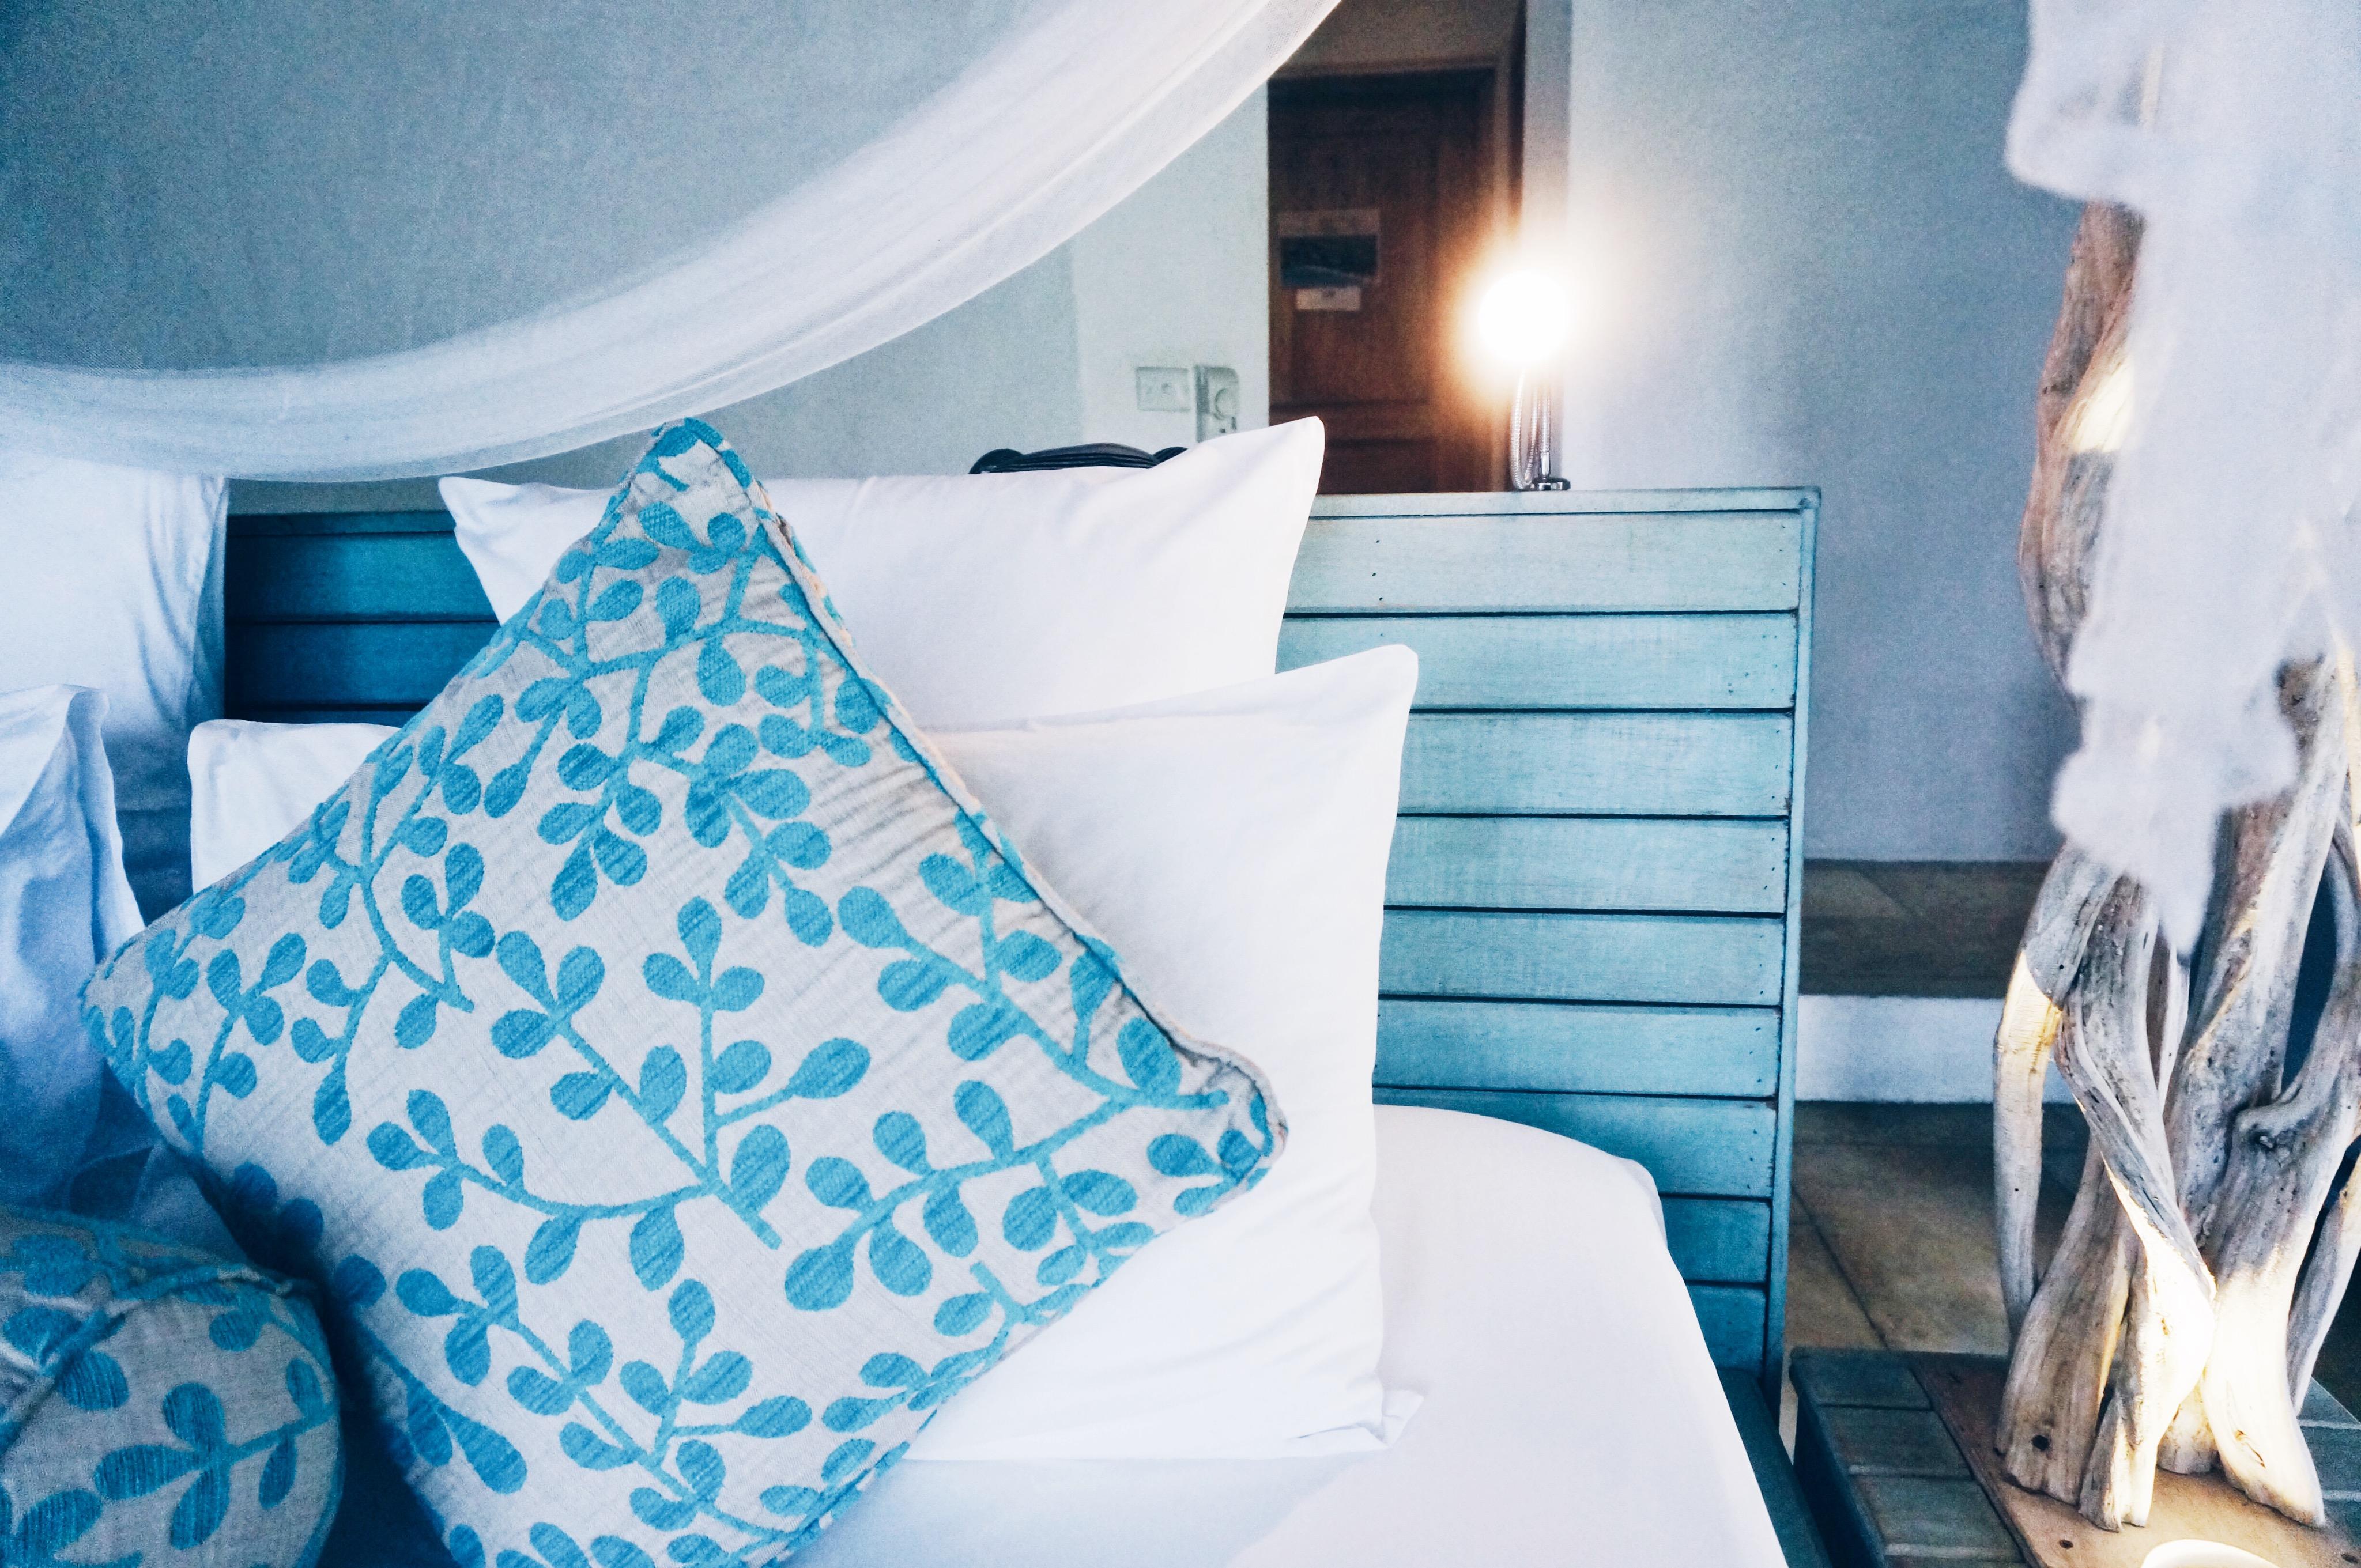 Traumhotel im Beachstyle, maritimes Hotel in Thailand, Koh Yao Noi